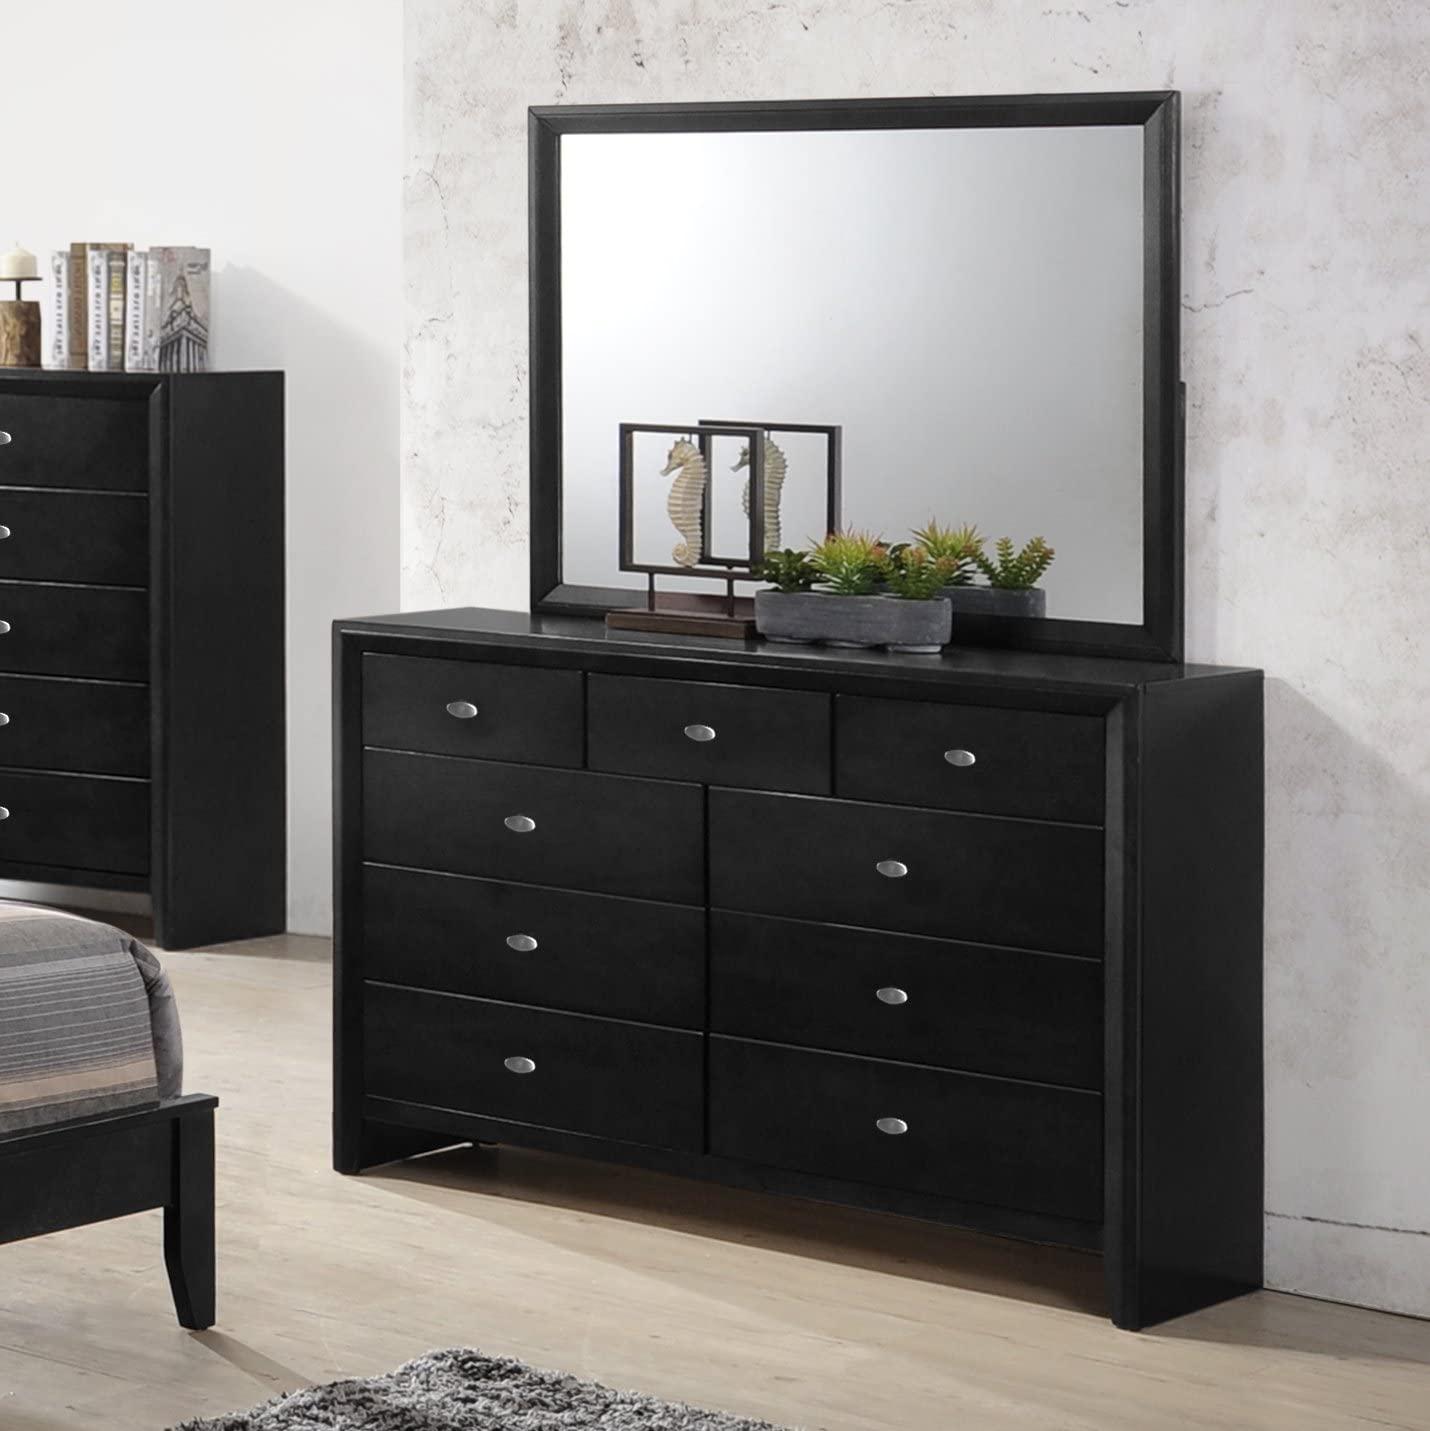 Gloria Black Finish Wood Dresser and Mirror - a good cheap bedroom dresser